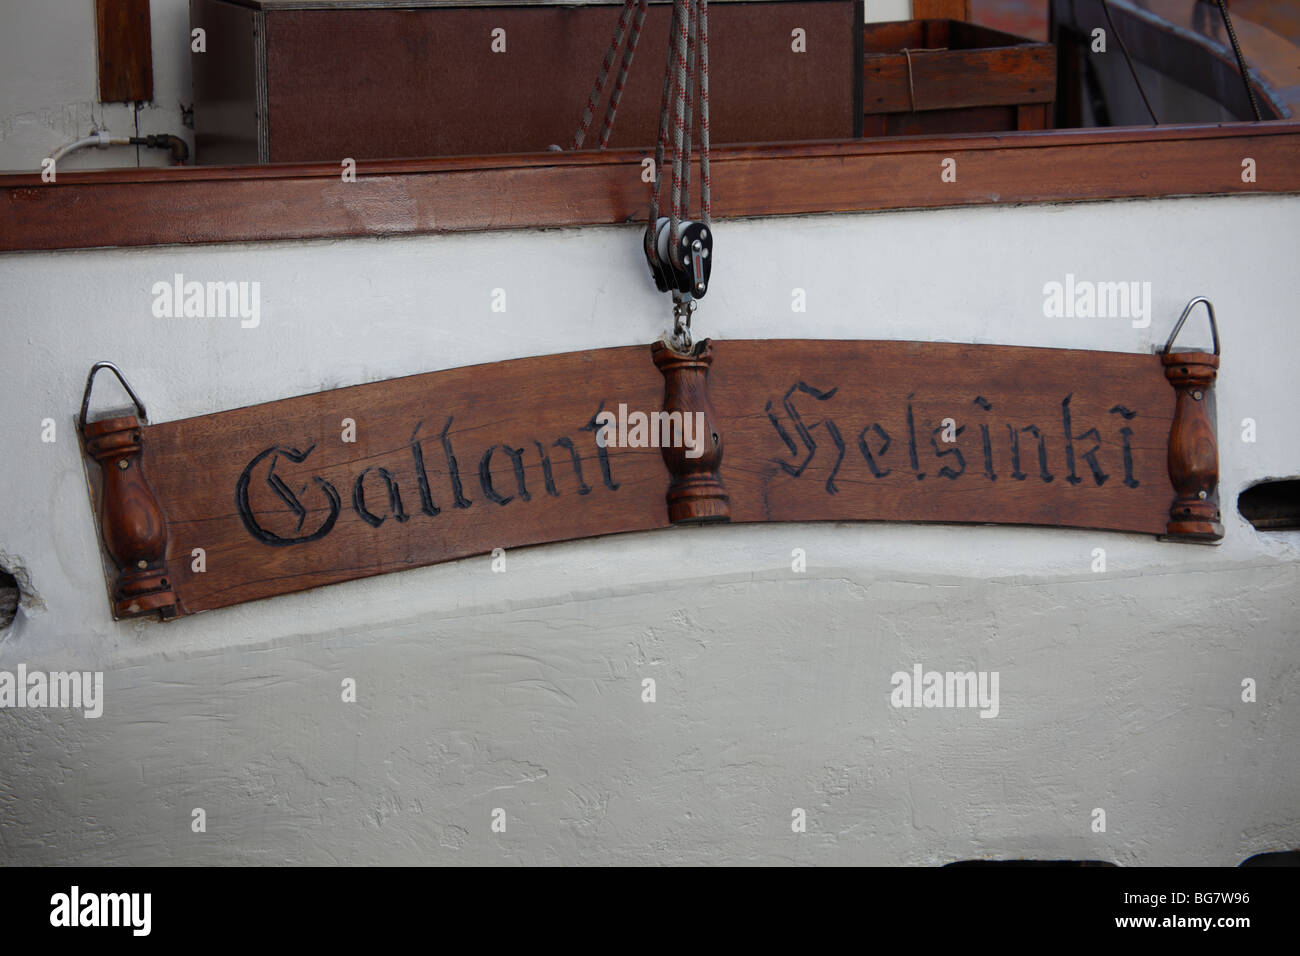 Finland, Helsinki, Helsingfors, South Harbour Esplanade, Boat Name Sign - Stock Image